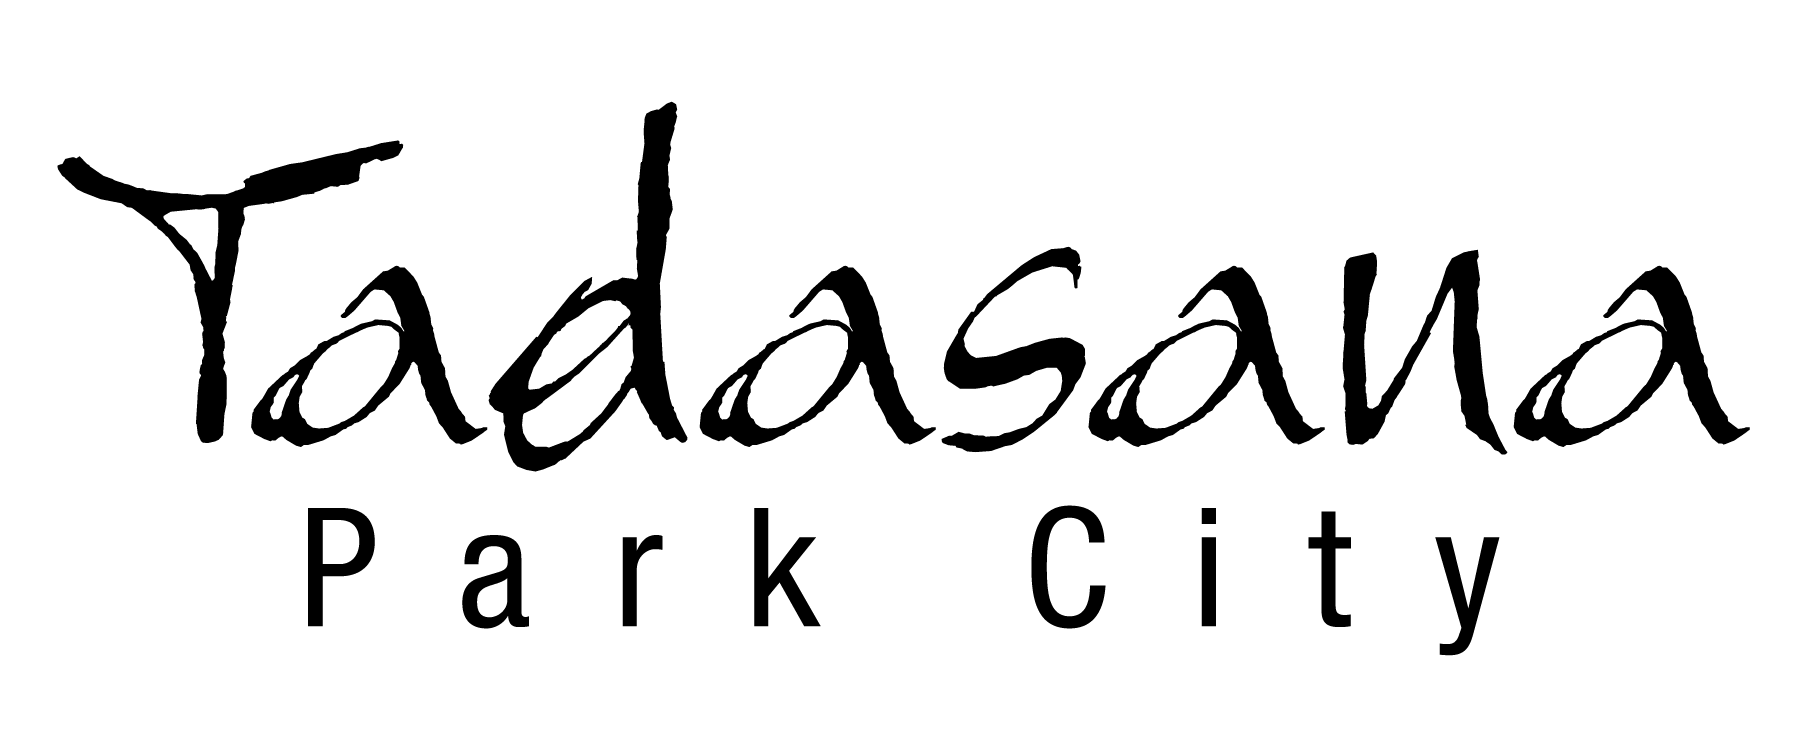 TadasanaLg-01